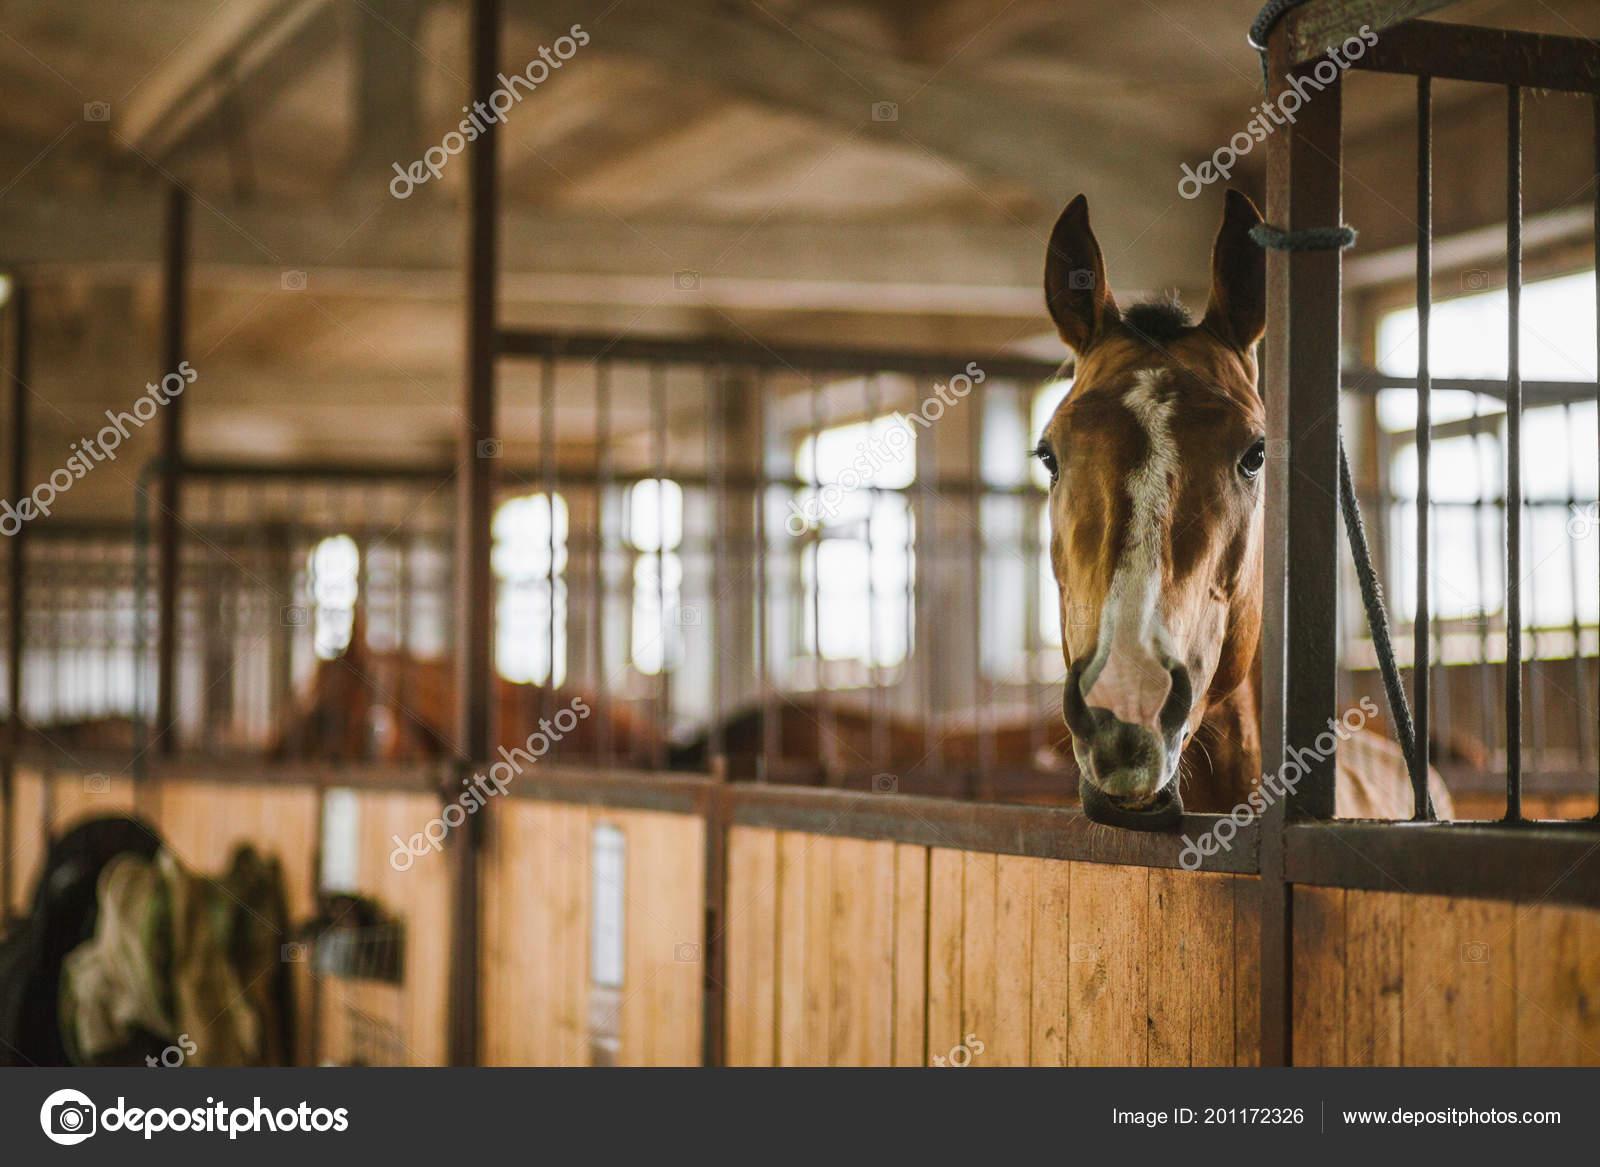 Beautiful Horses Animals Pasture Stables Horseback Riding Stock Photo C Vitizh 201172326